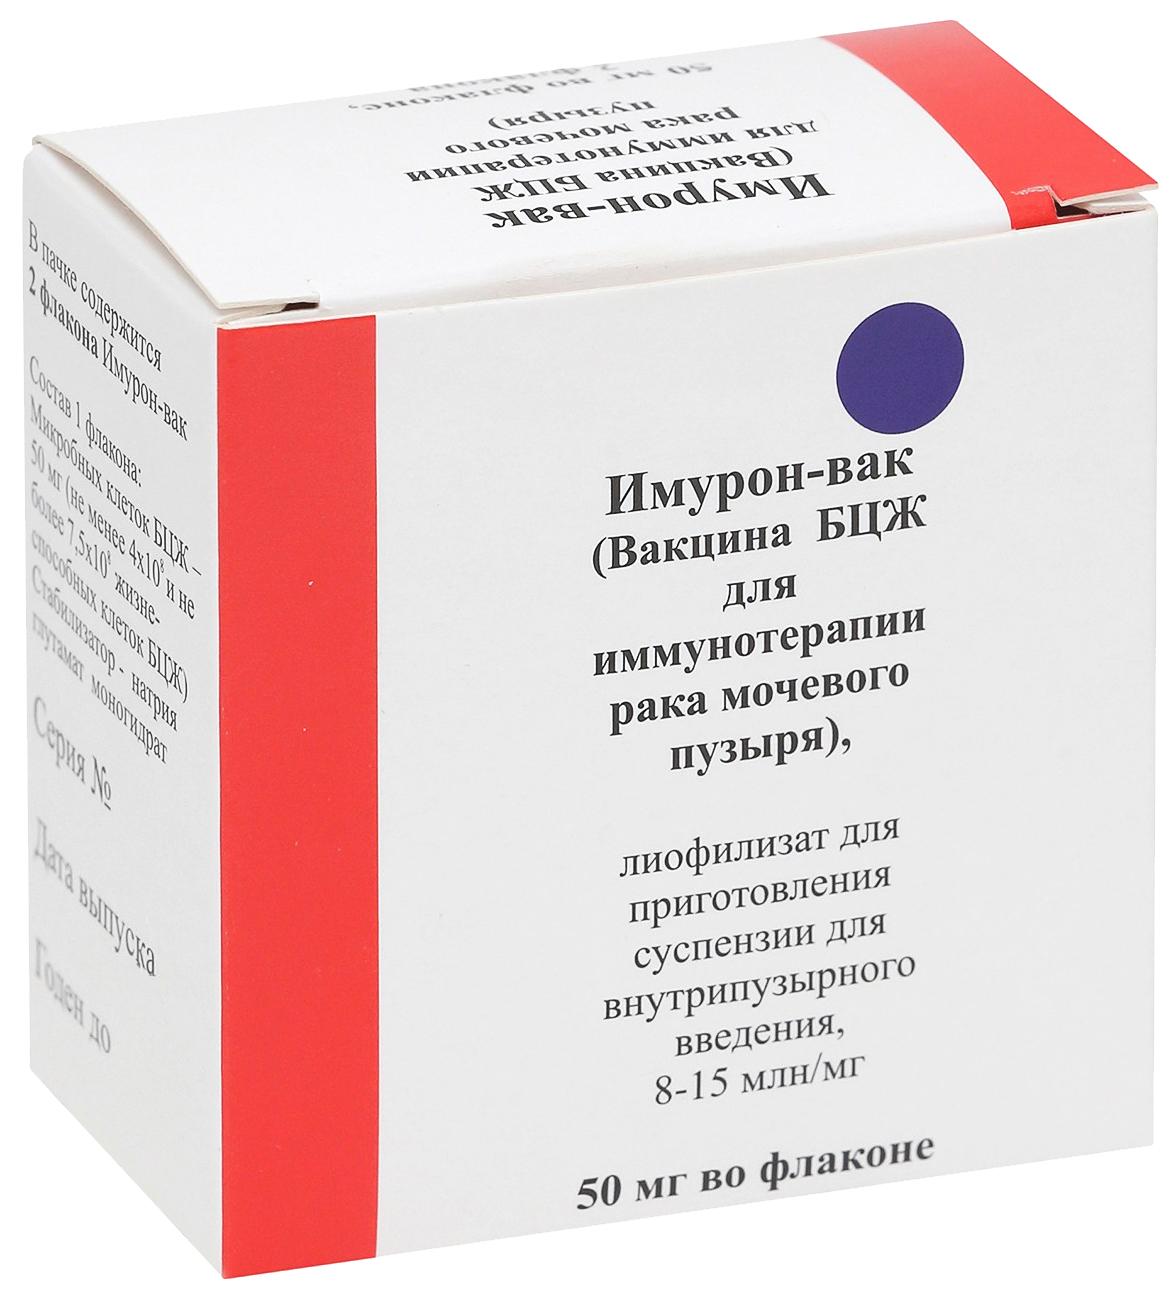 Имурон-вак лиоф.д/суспензия д/внутрипузырн.введ.8-15 млн/мг 50 мг фл.№2